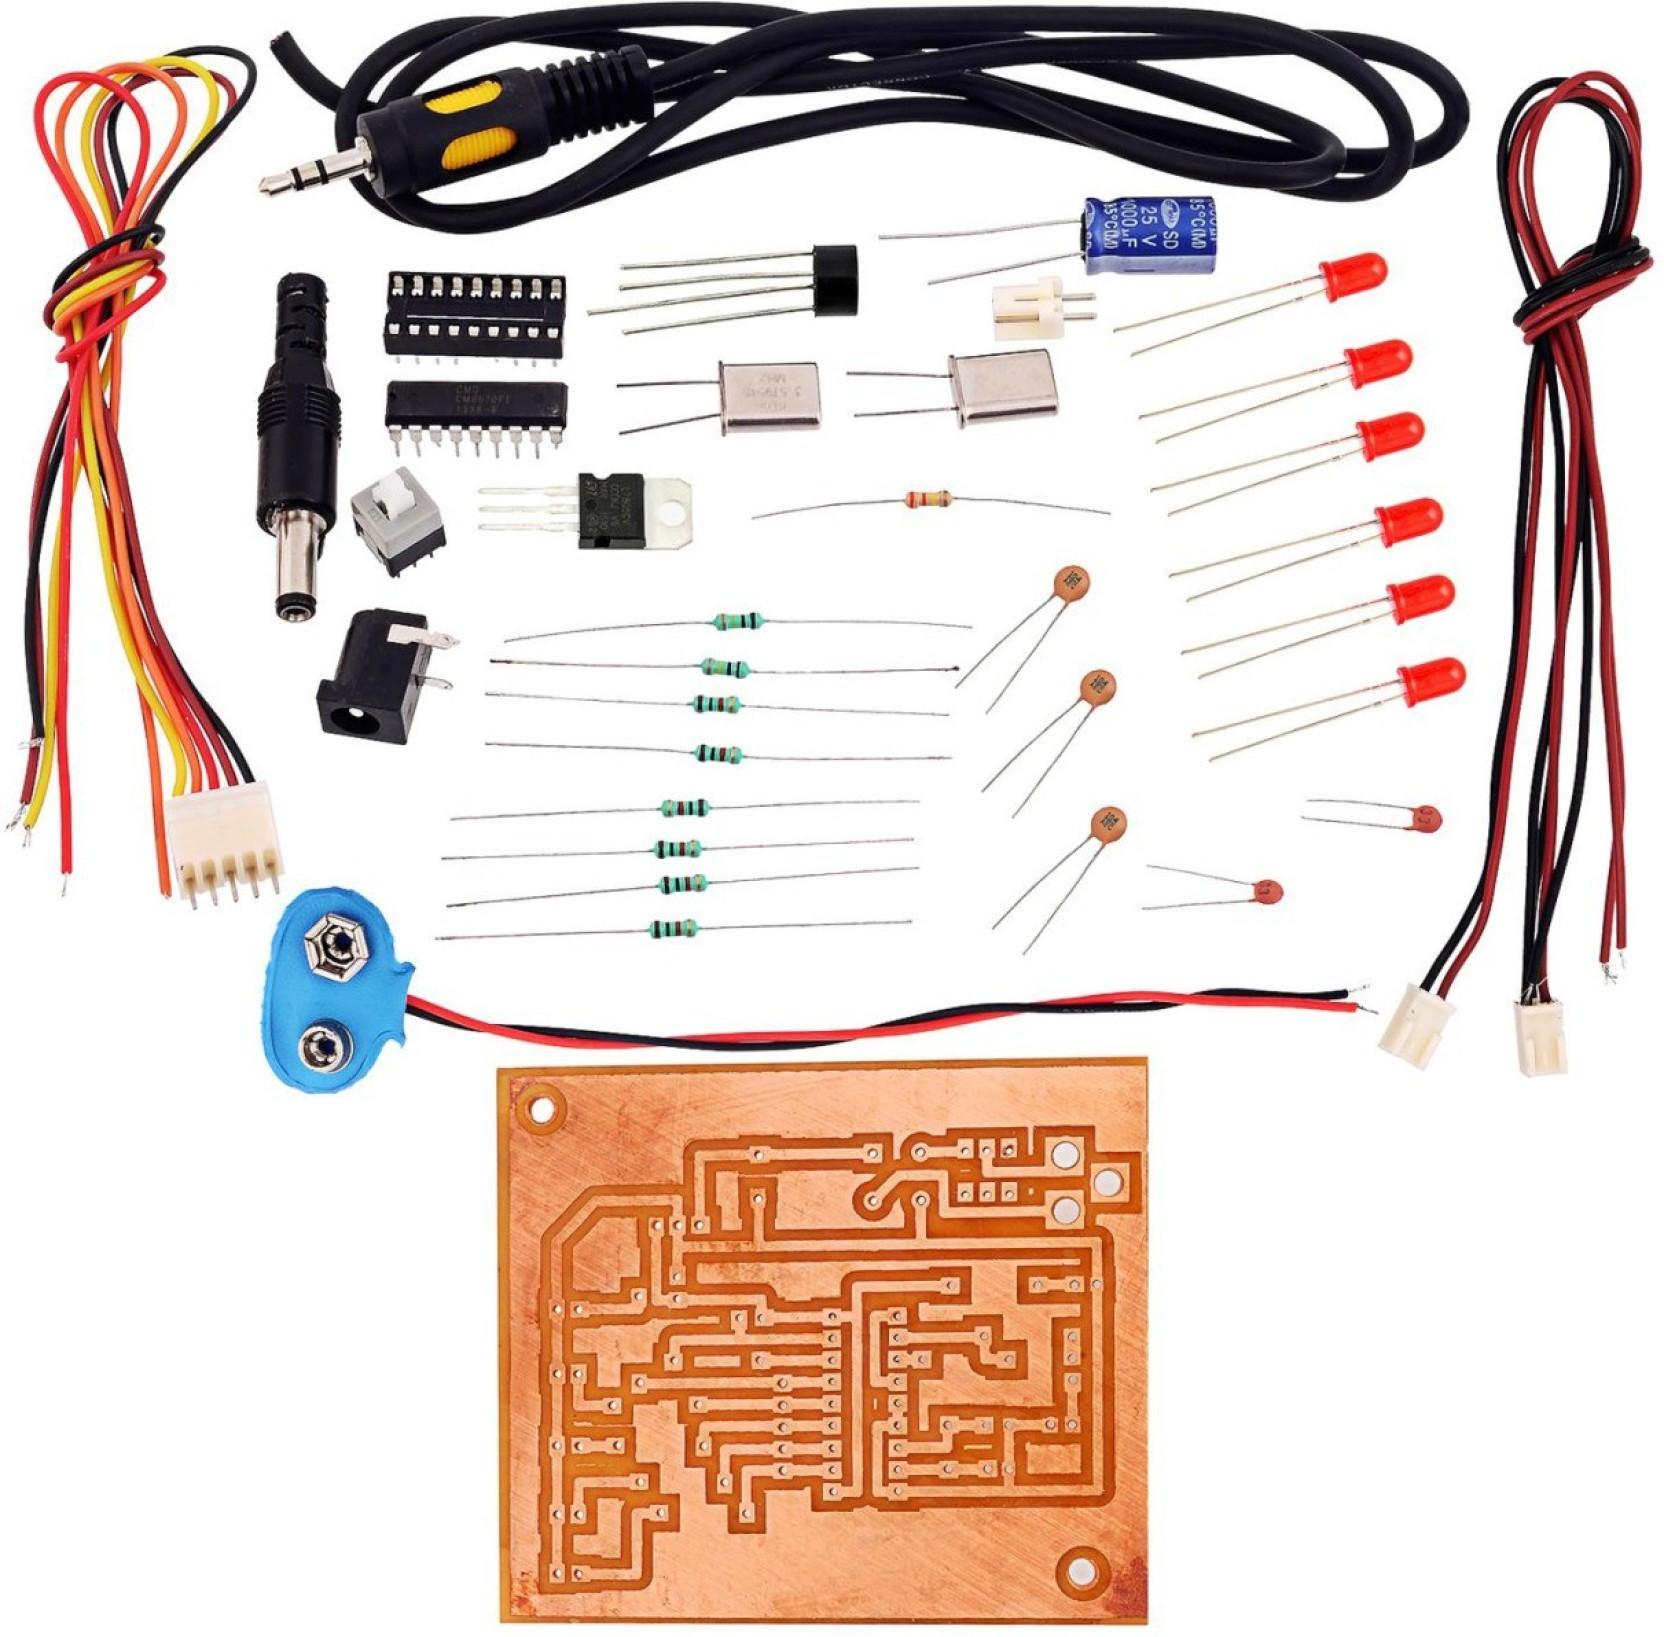 Kitsguru Dtmf Receiver Ic Mt8870 Tester Lgkt052 Educational Decoder Working Electronic Circuits Youtube Hobby Kit Add To Cart